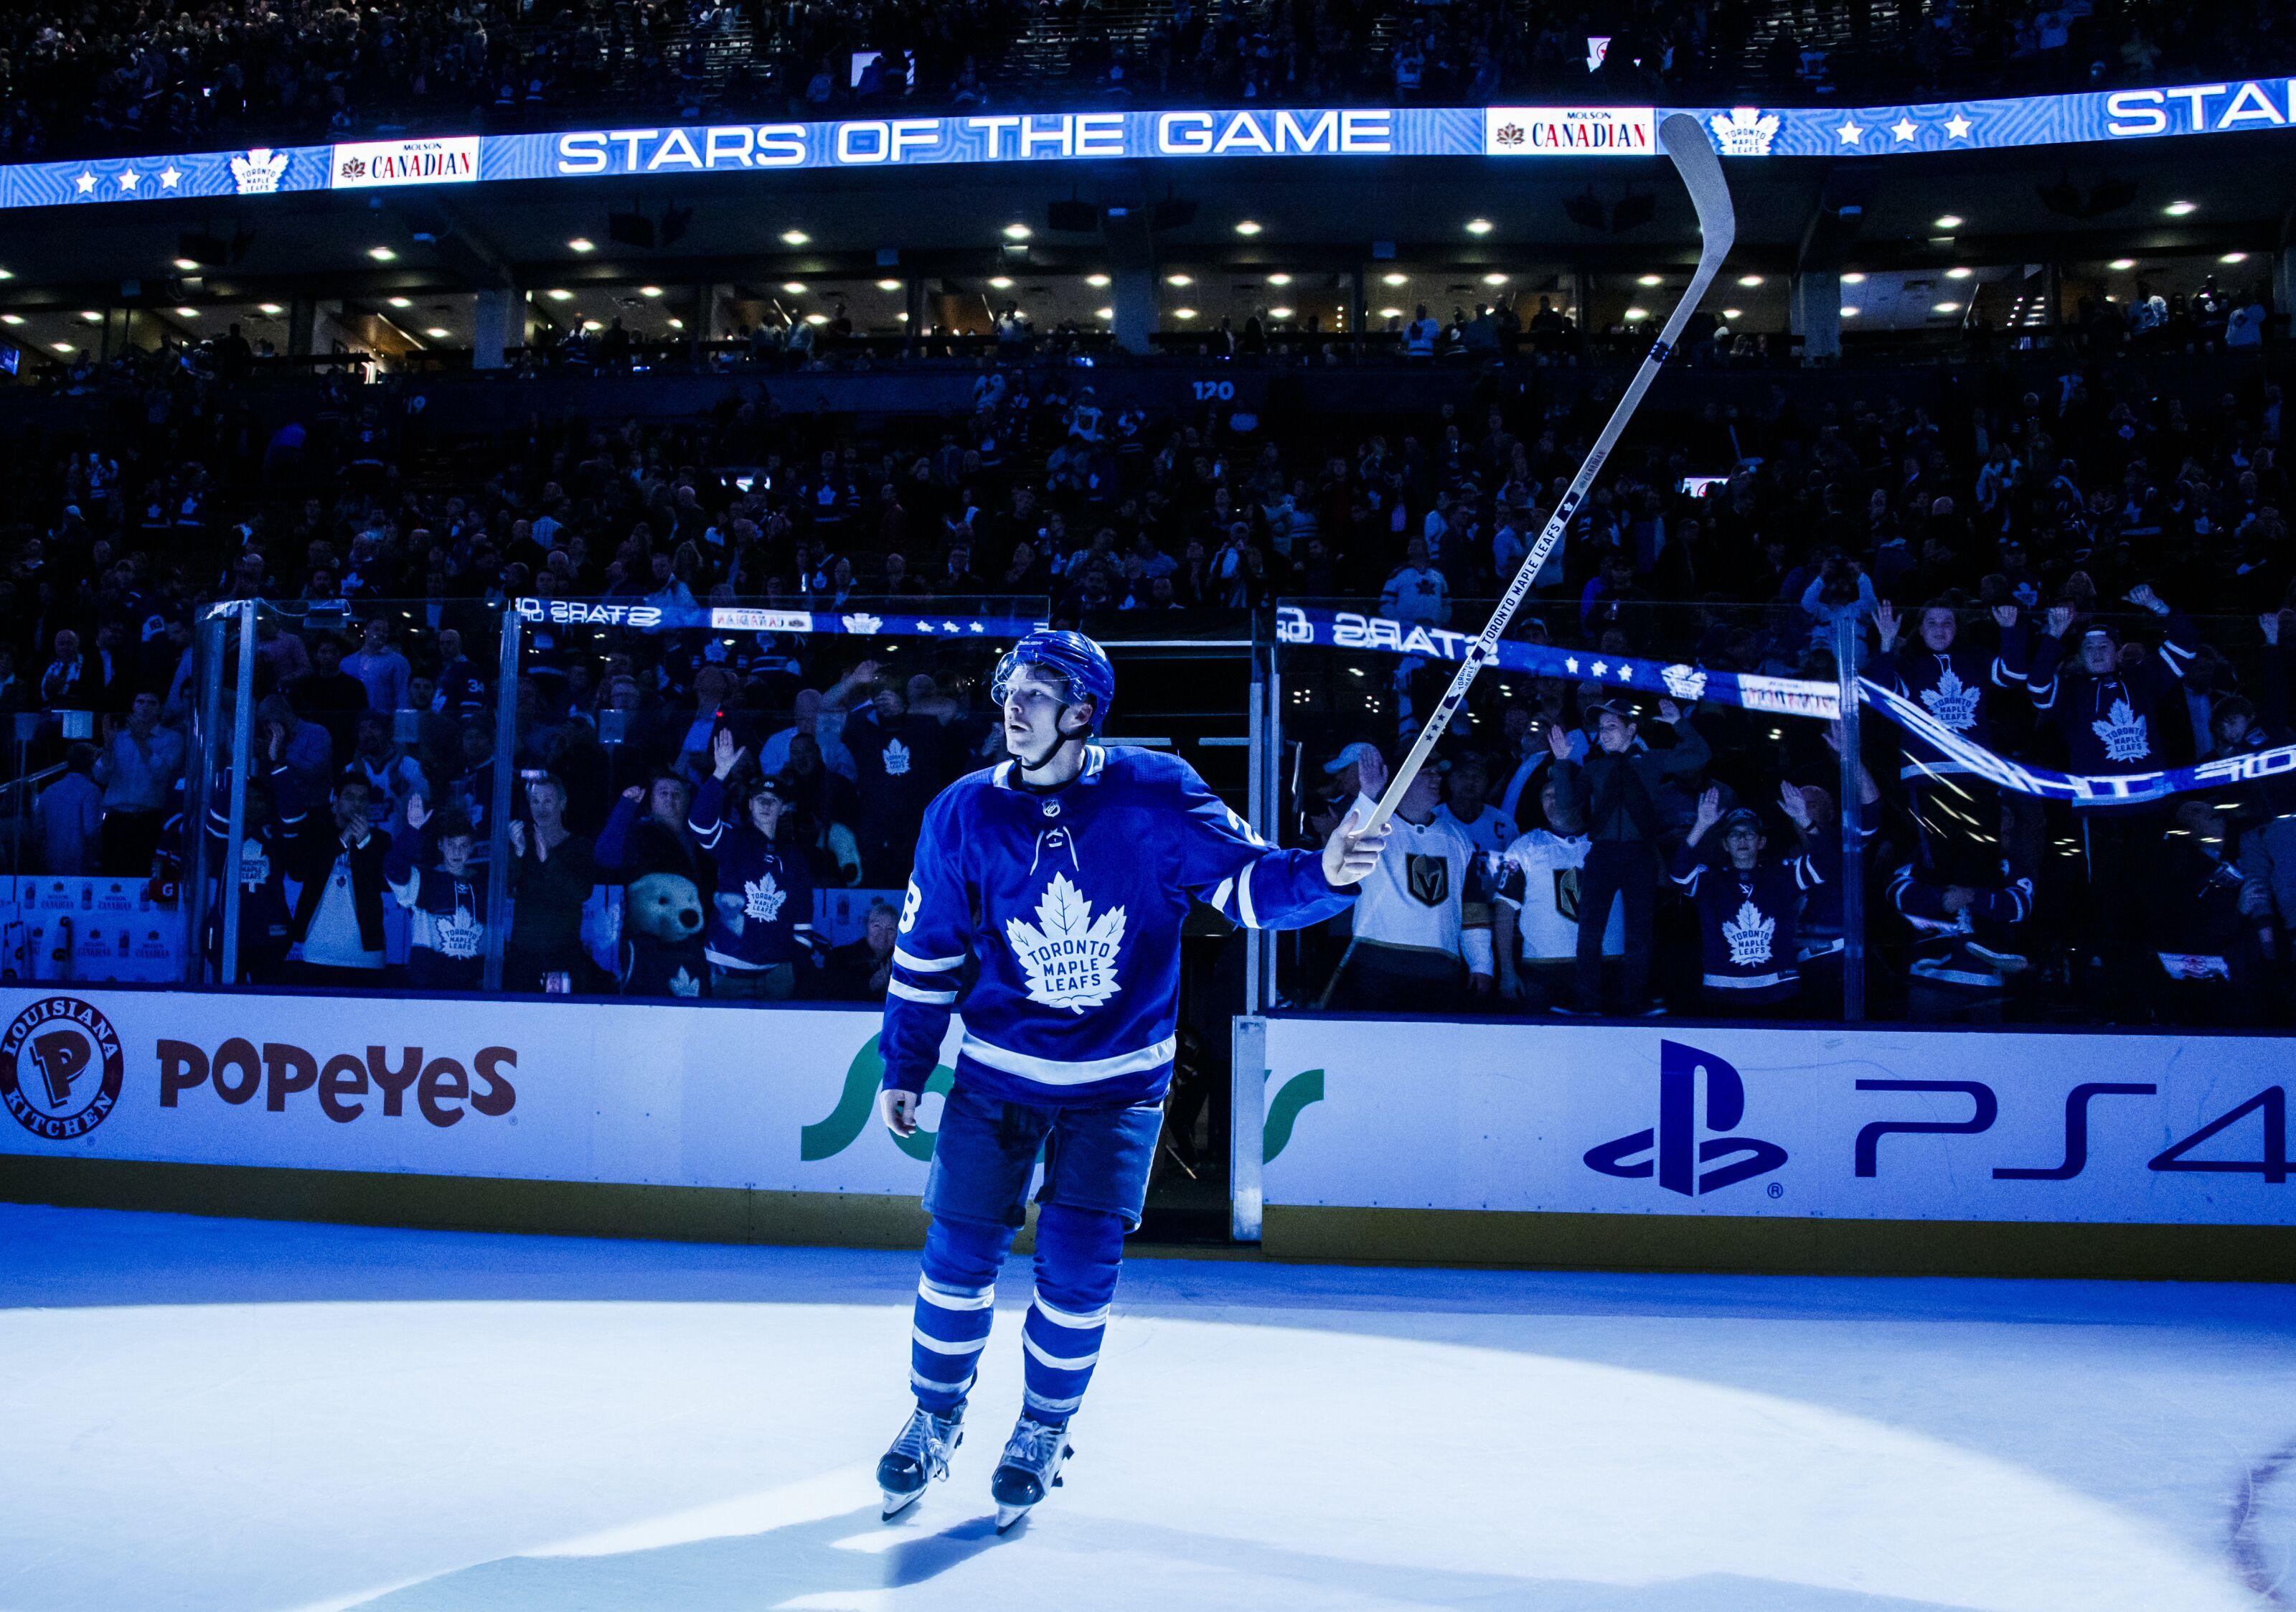 Former Toronto Maple Leafs Connor Brown Flourishing with Senators